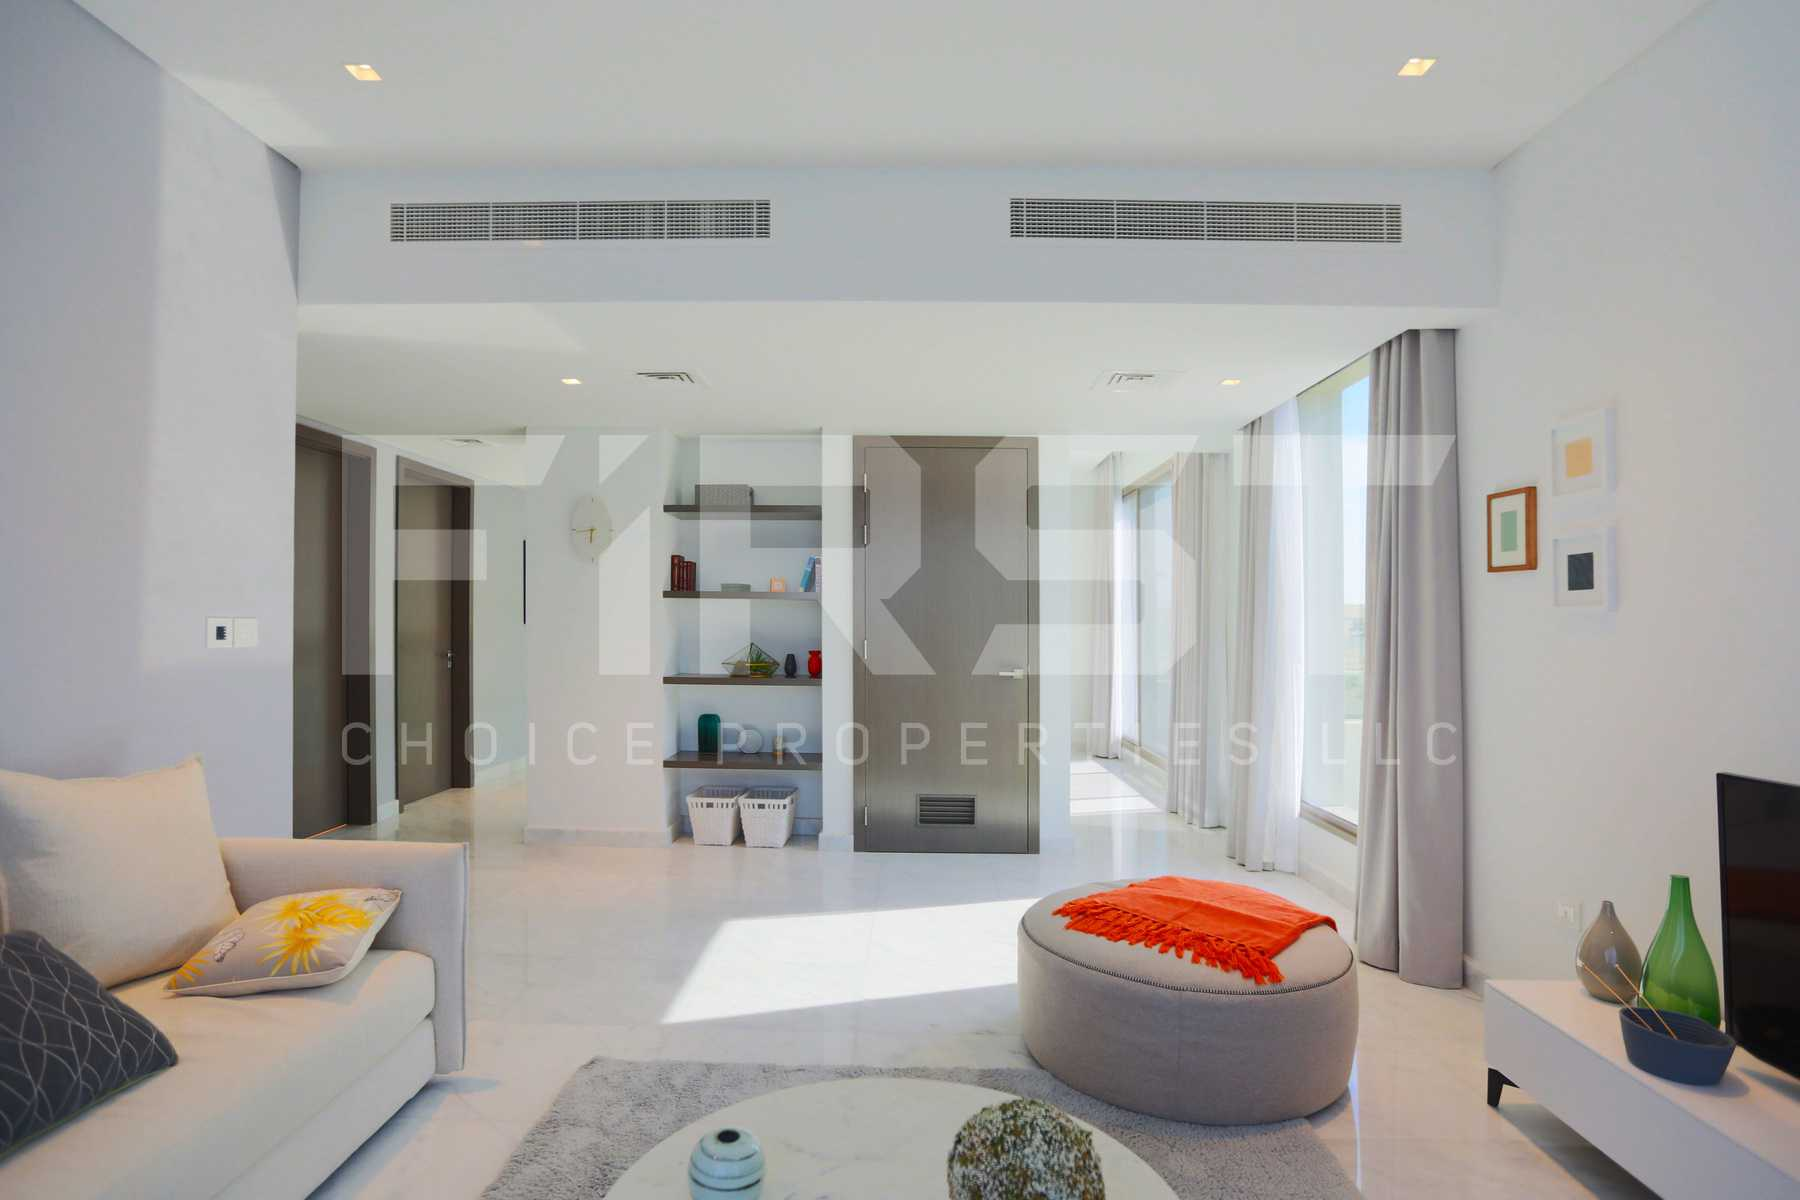 Internal Photo of 4 Bedroom Villa Type 4F in Yas Acres Yas Island Abu Dhabi UAE (8).jpg